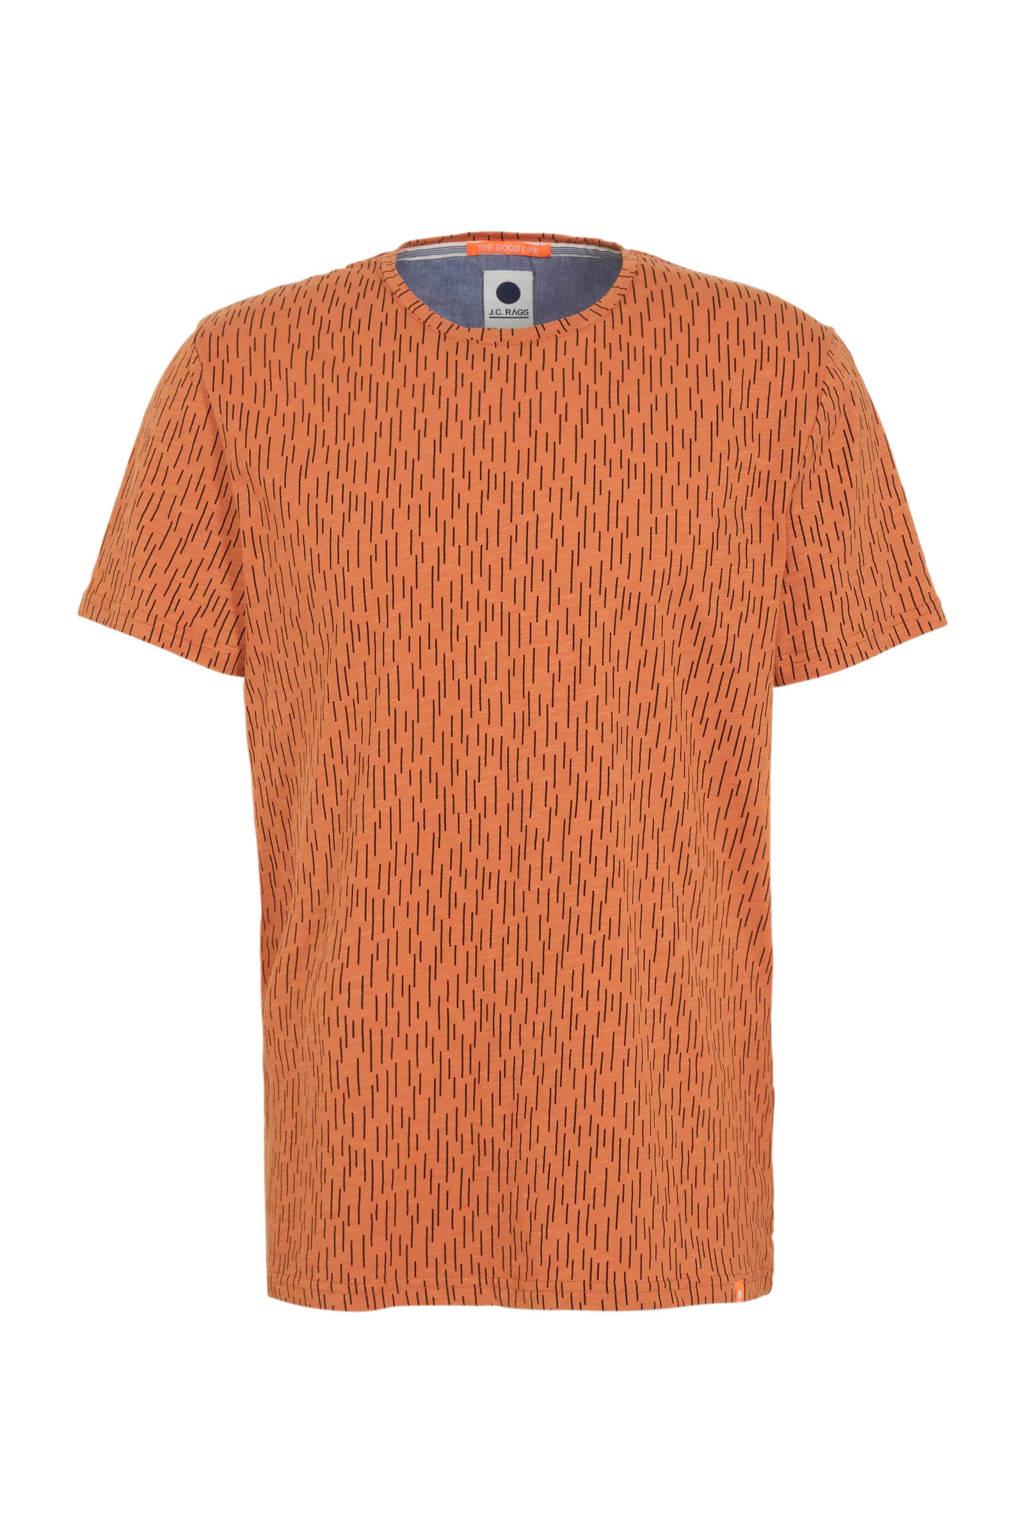 J.C. Rags T-shirt met all over print oranje/zwart, Oranje/zwart